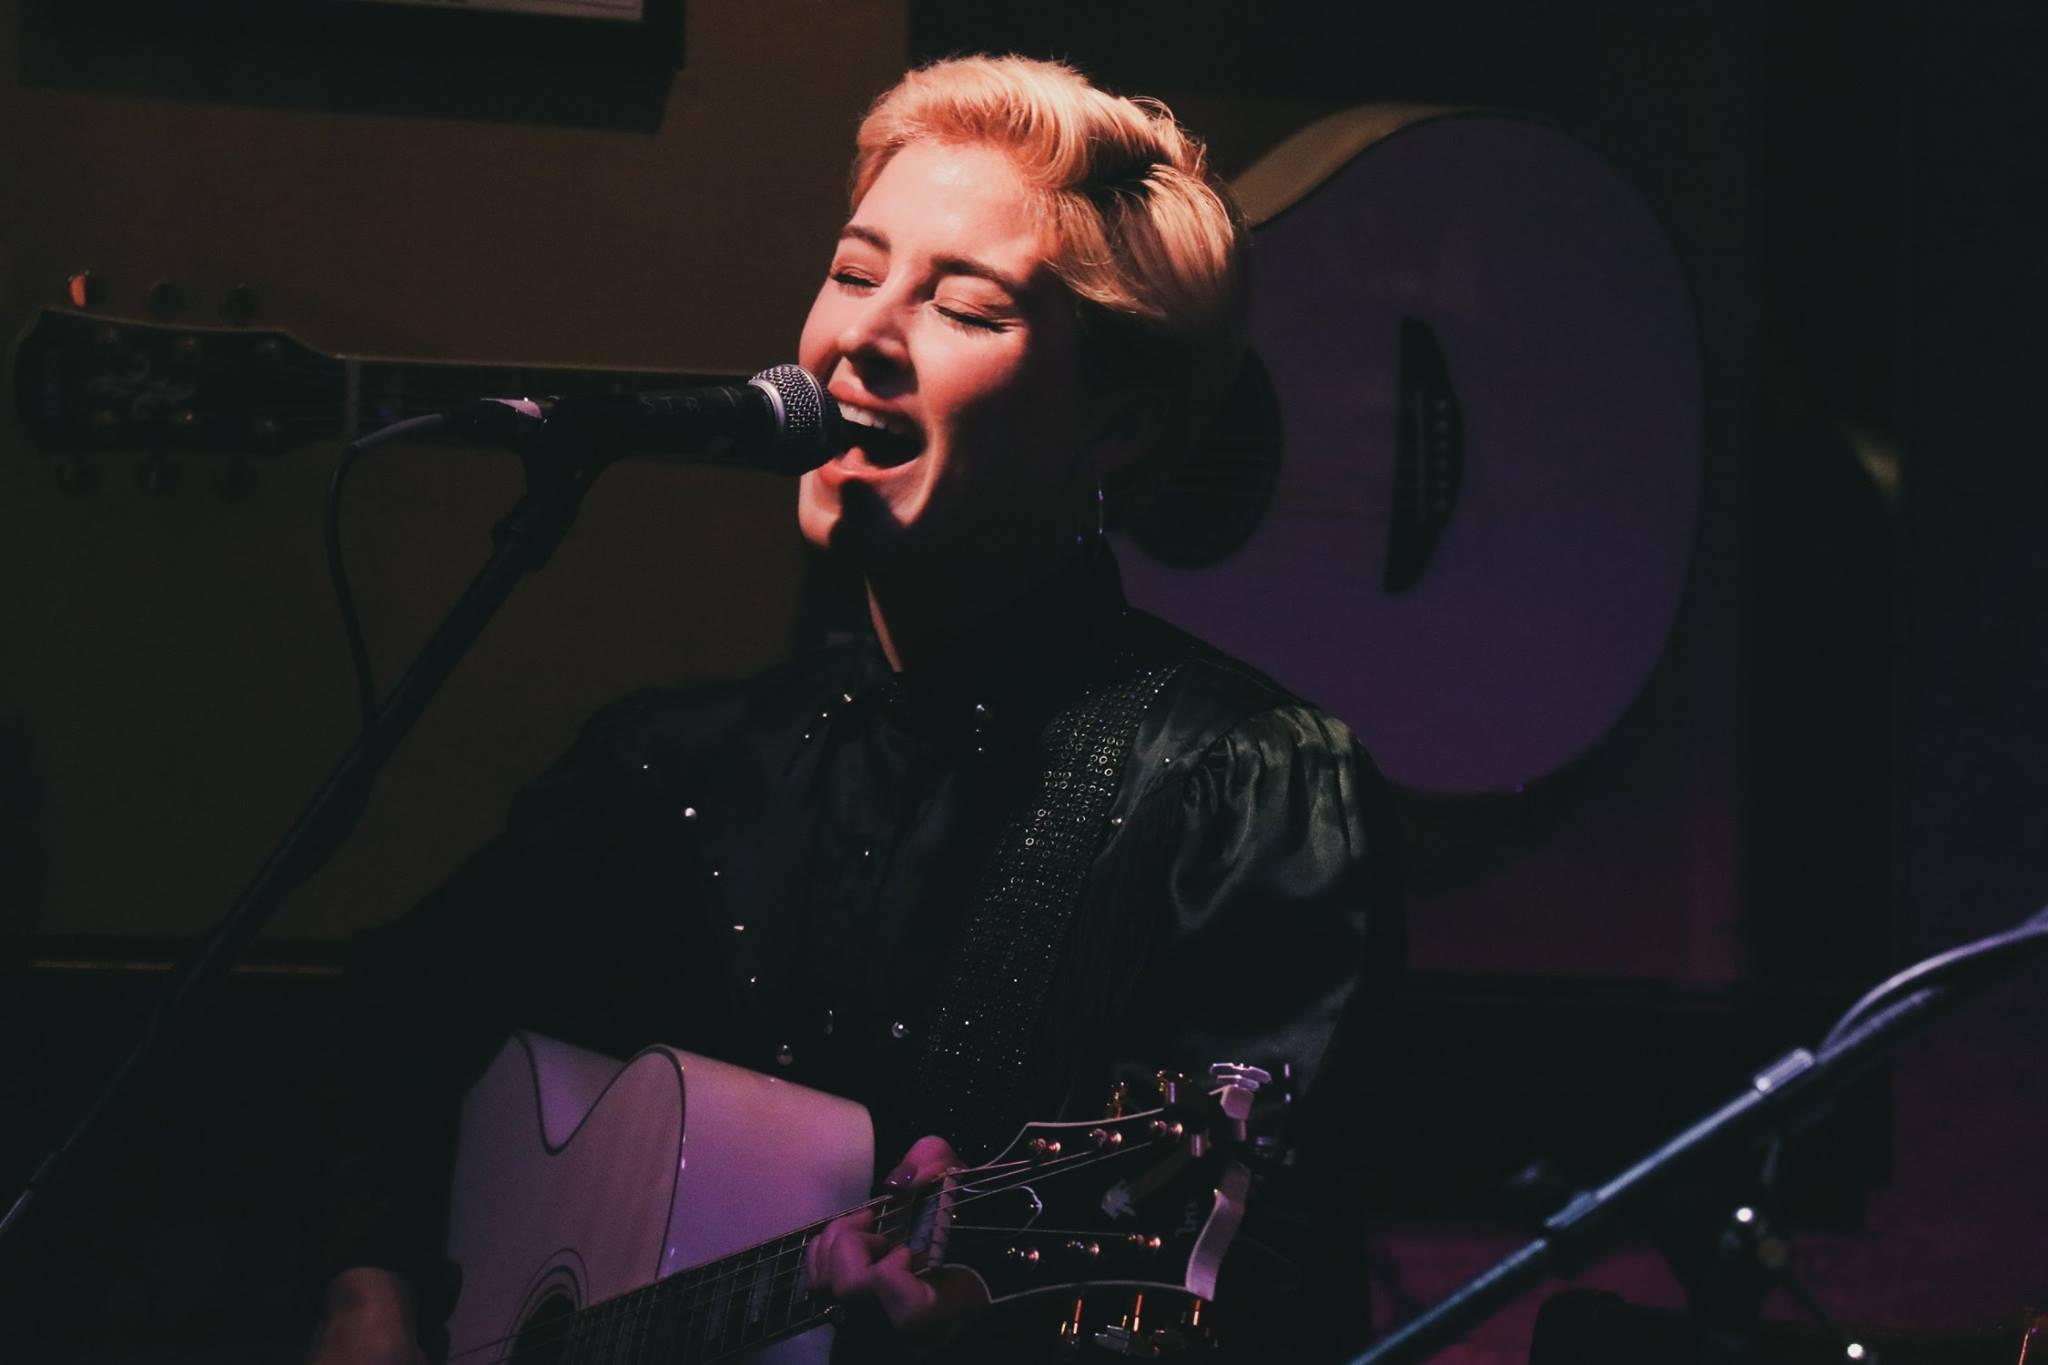 Natalie Hemby, Ashley Gorley, busbee, Liz Rose Share Songs On Tin